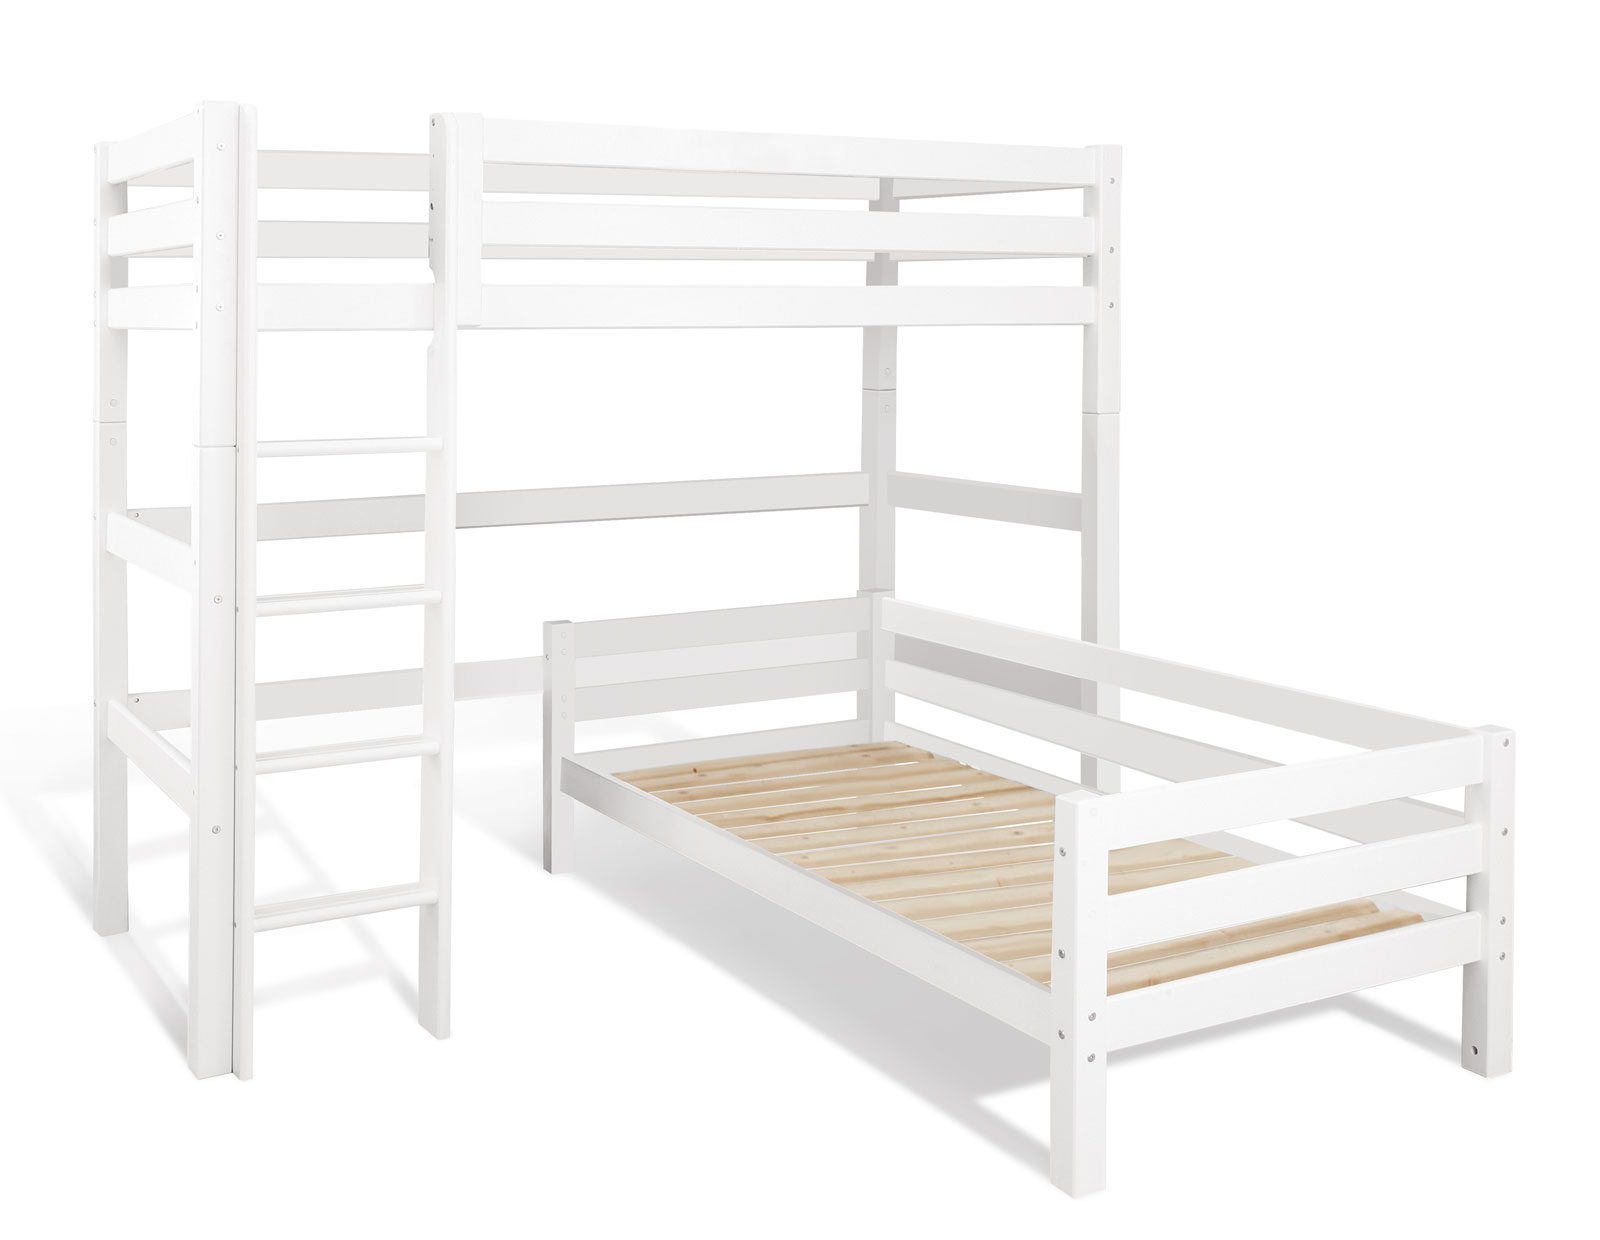 Etagenbett Lattenrost : Eck etagenbett in weiß aus massivem kiefernholz kids royalty